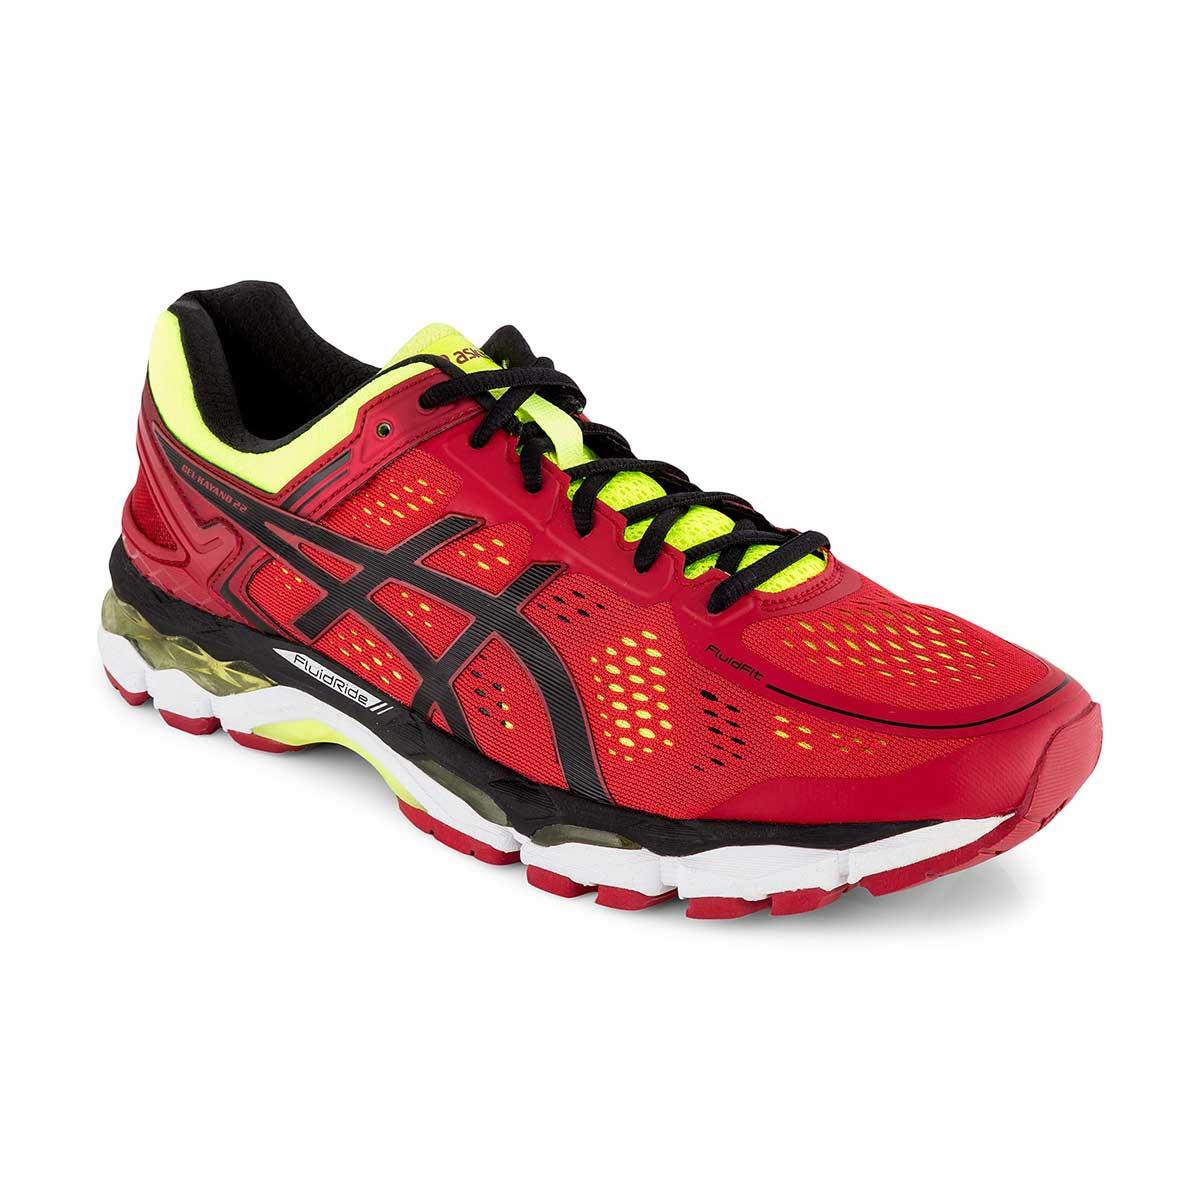 timeless design best wholesaler amazing selection Asics Gel-Kayano 22 Running Shoes (Red Pepper/Black/Flash Yellow)